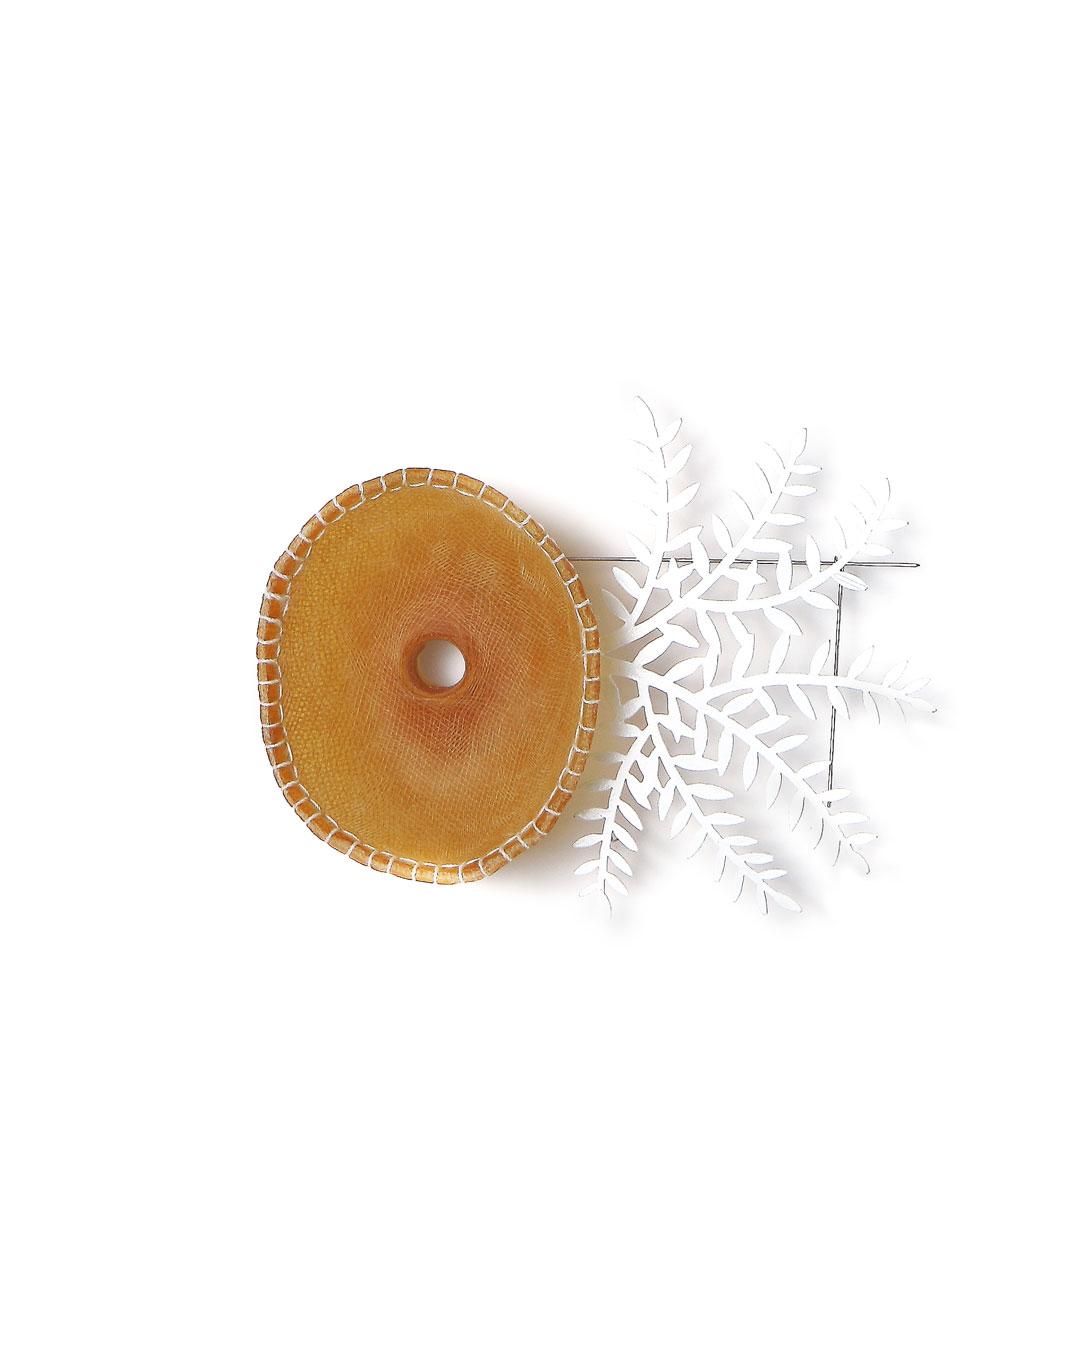 Dongchun Lee, Inhale Exhale, 2009, brooch; latex, iron, gauze, thread, paint, 140 x 110 x 30 mm, €1040